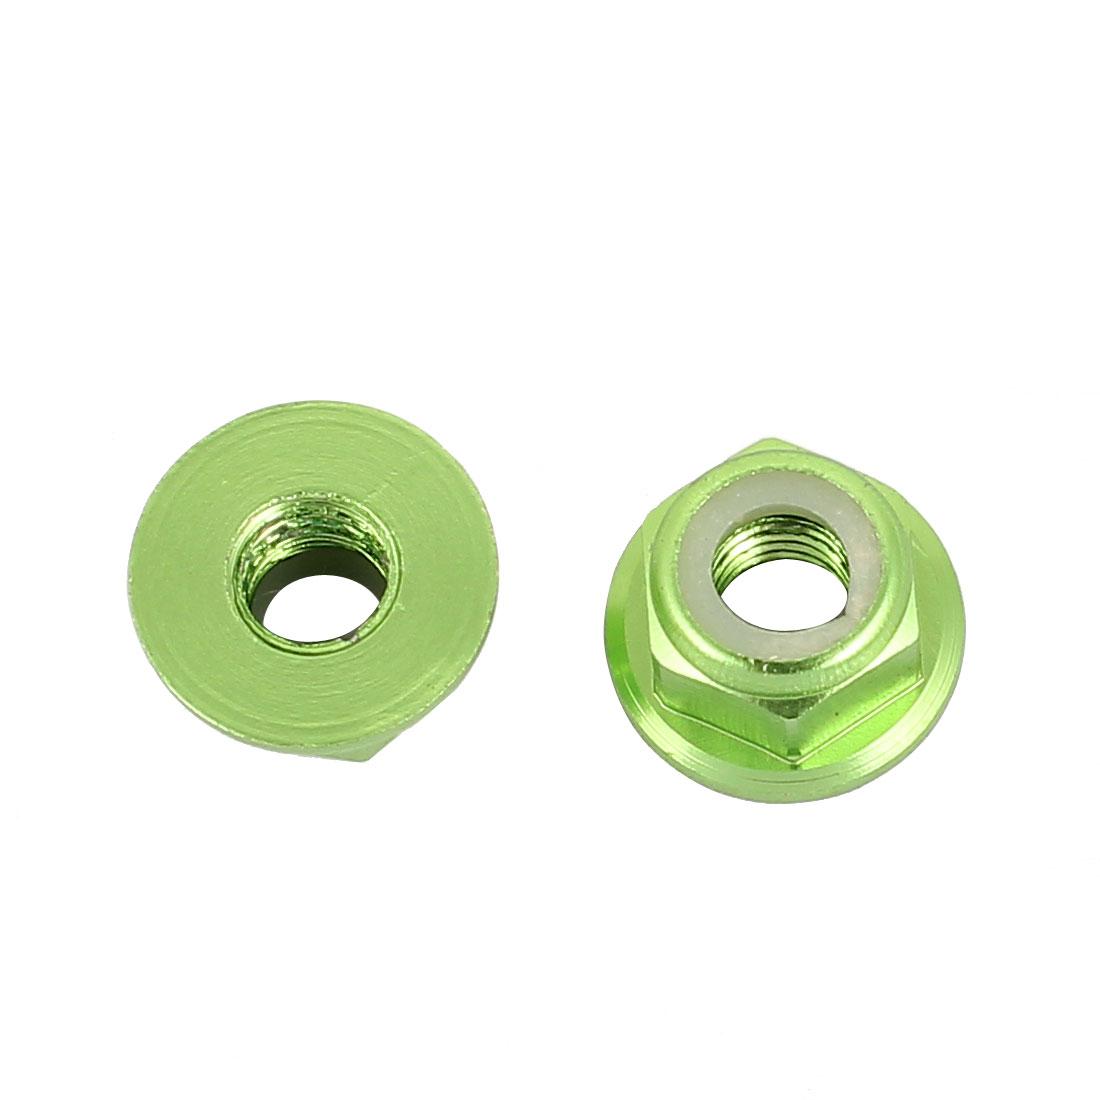 M5 Aluminum Alloy Green Flange Nut For RC Remote Vehicle DIY 2 Pcs